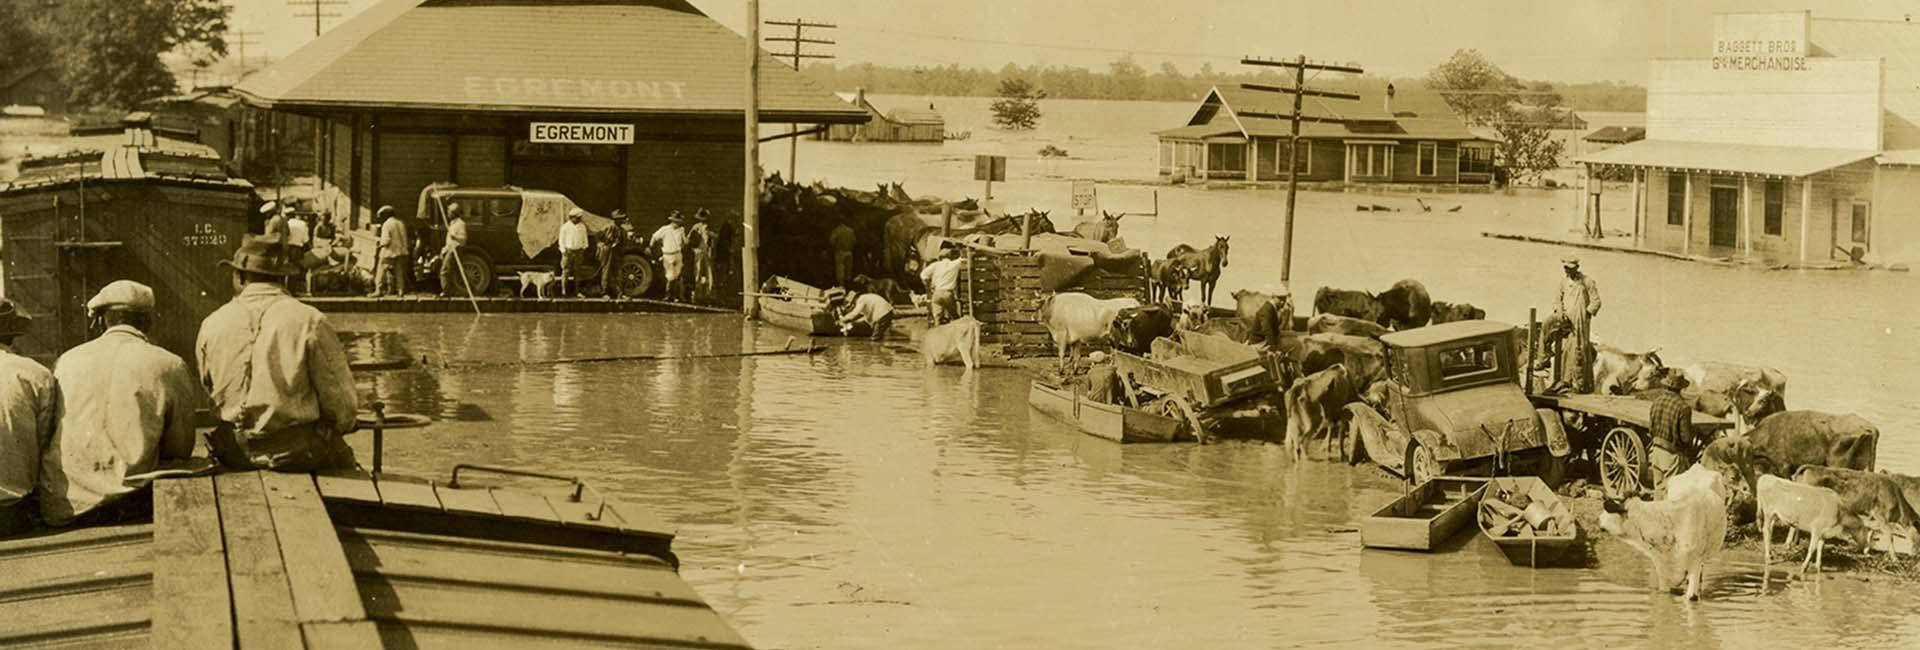 1927 Flood